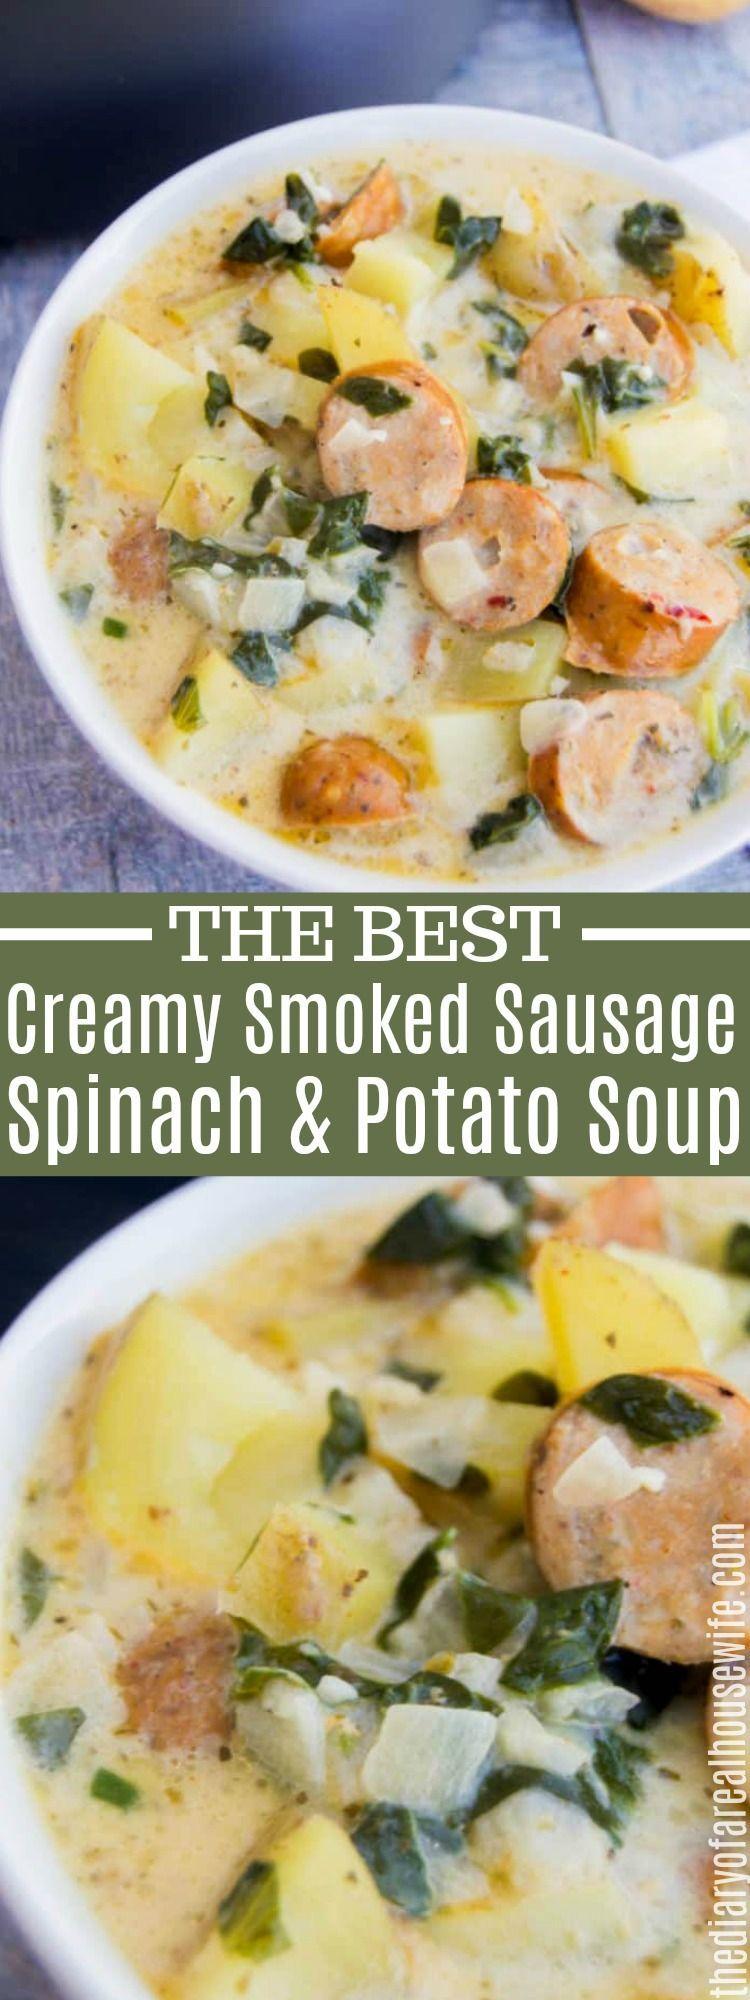 Creamy Smoked Sausage Spinach and Potato Soup #potatosoup